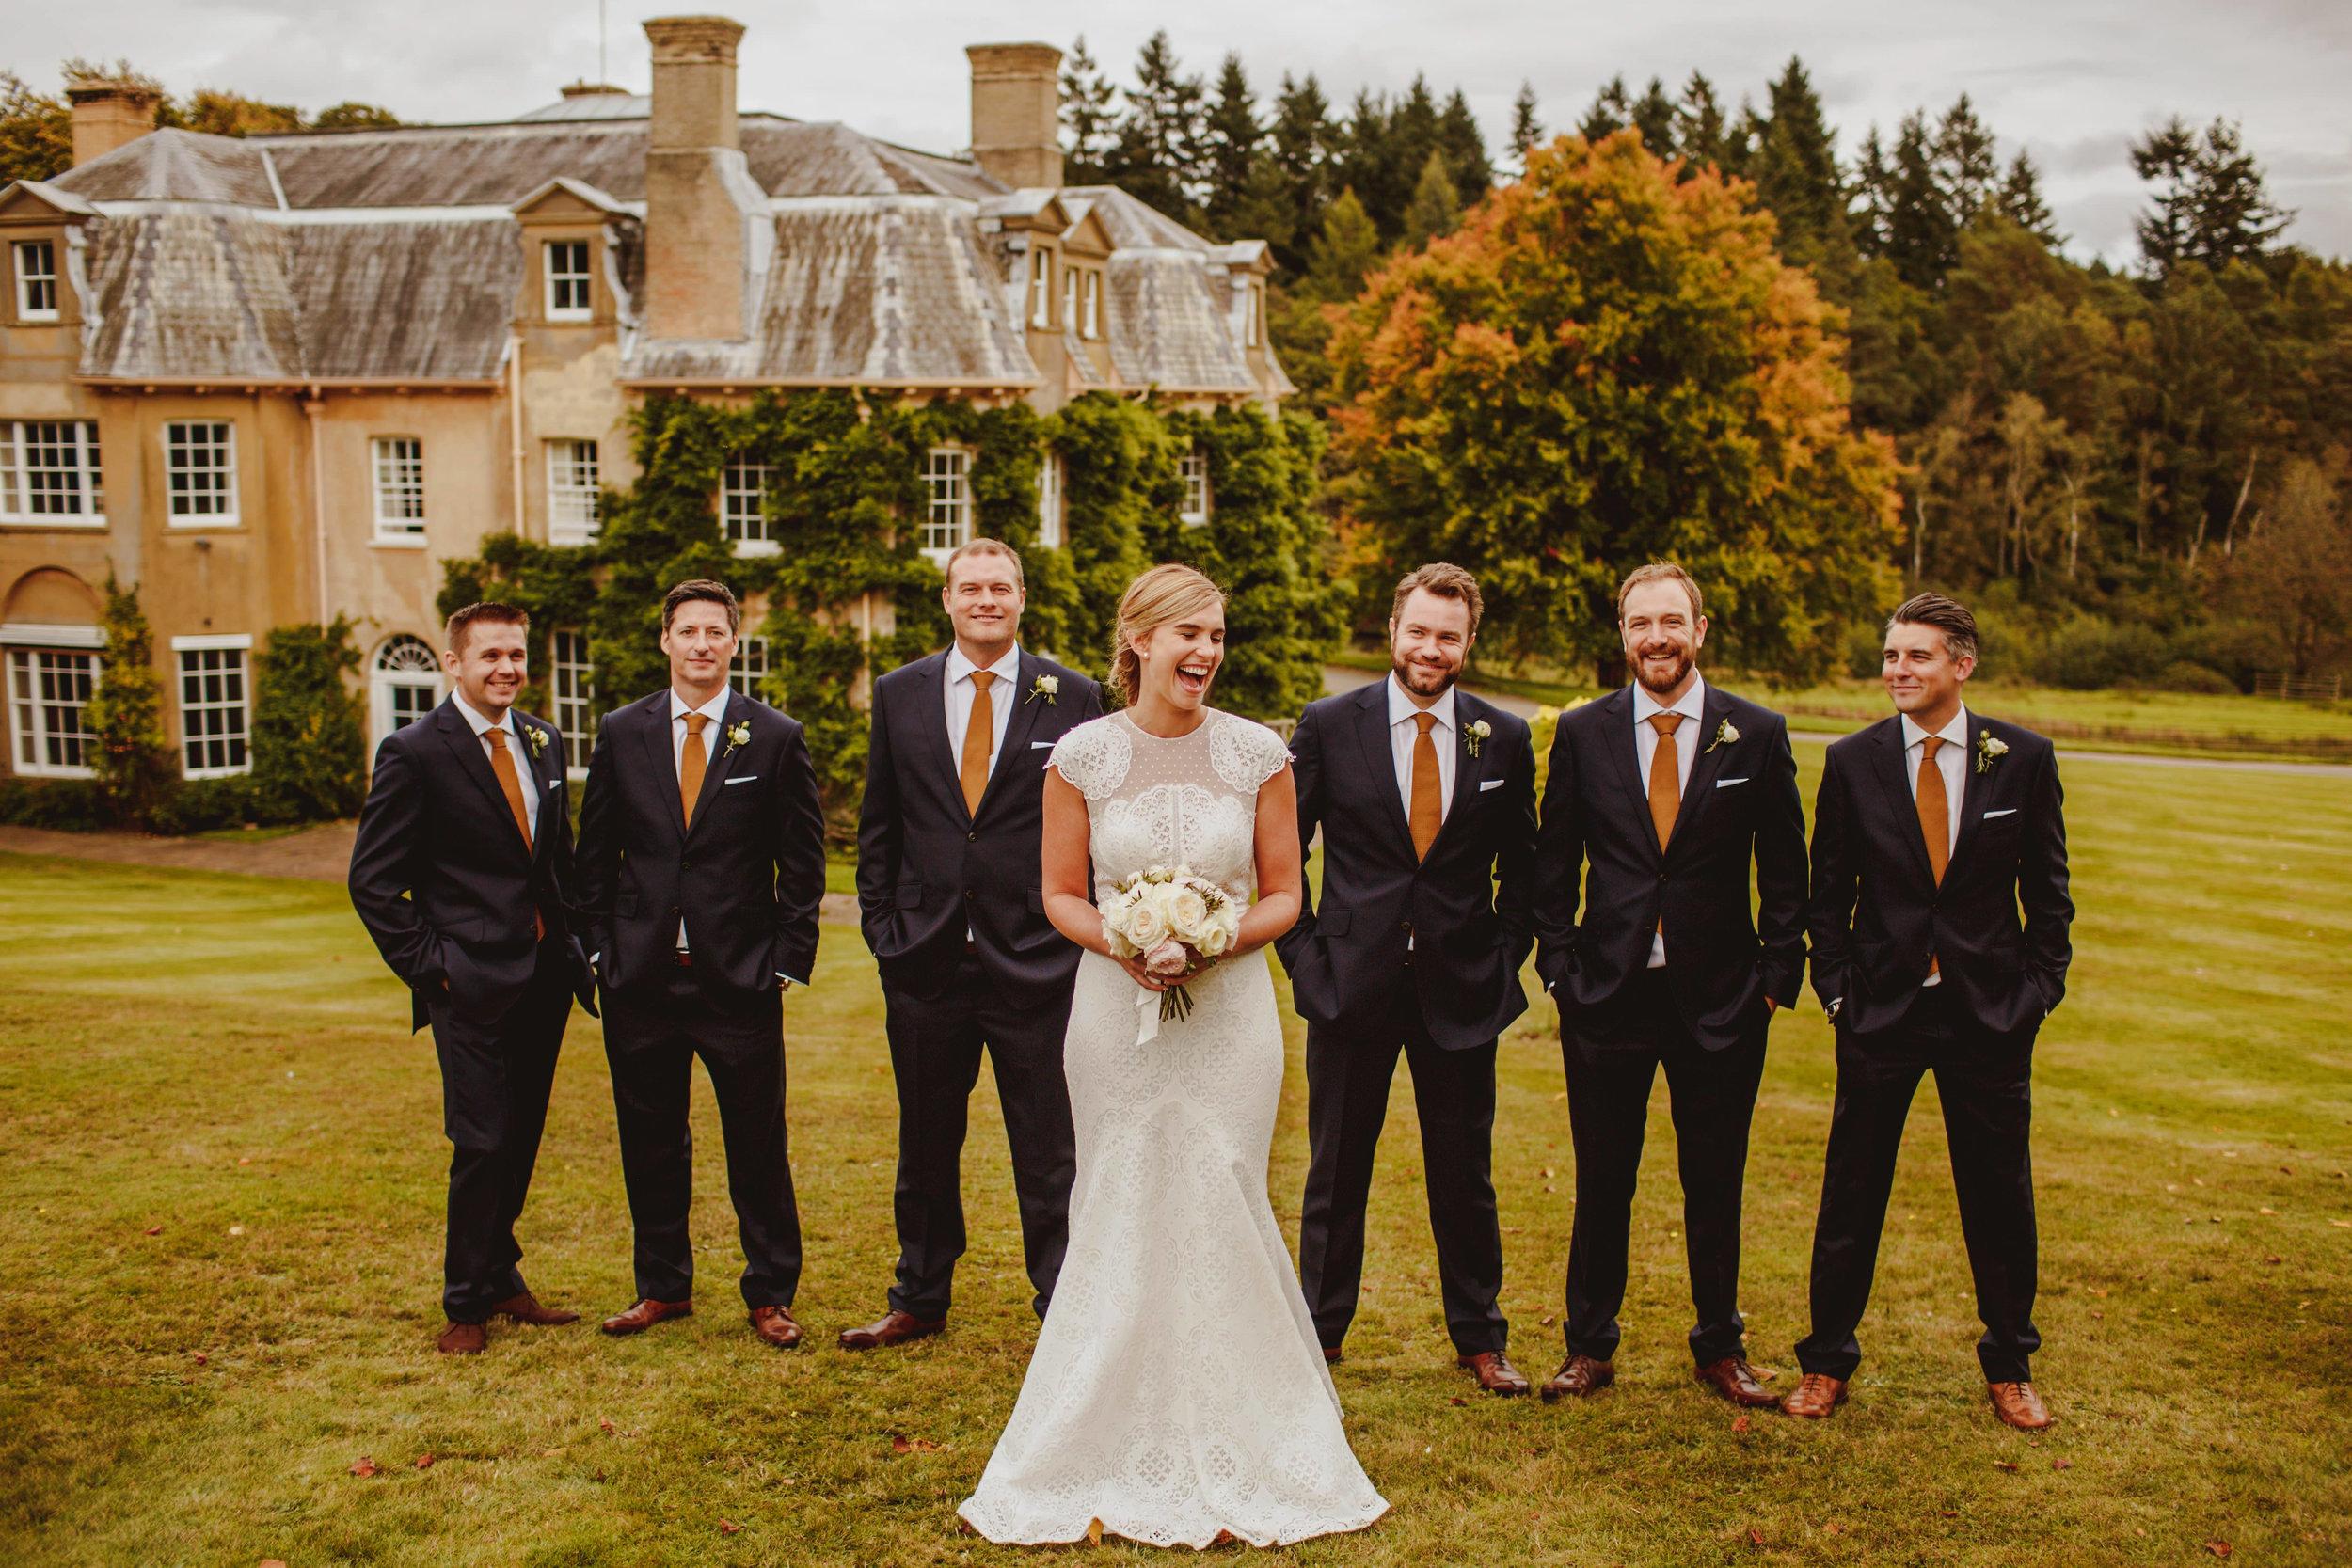 Surrey-wedding-photography-30.jpg